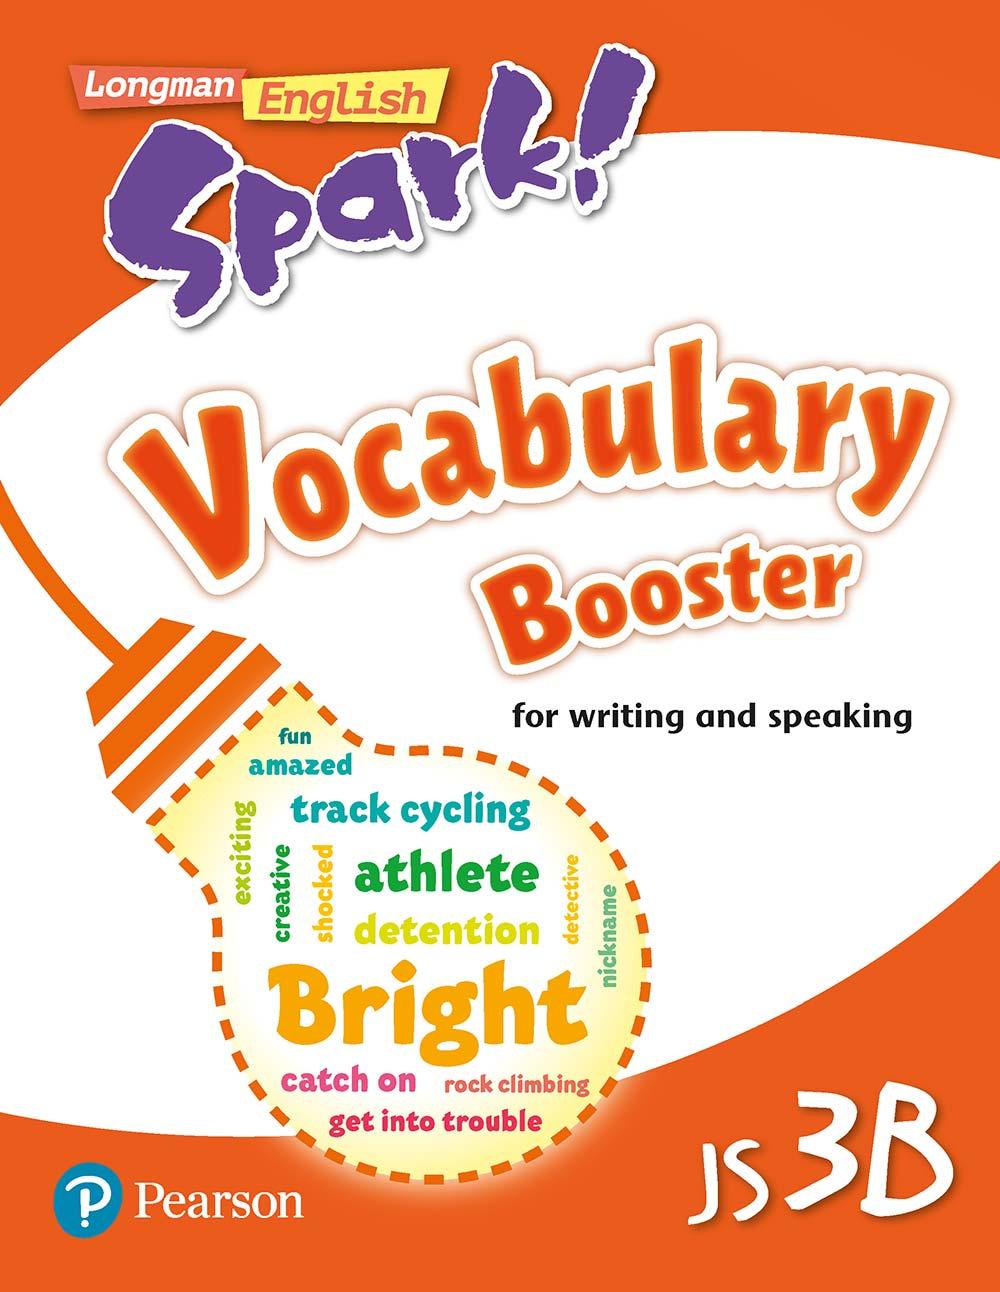 Longman English Spark! JS3B Vocabulary Booster